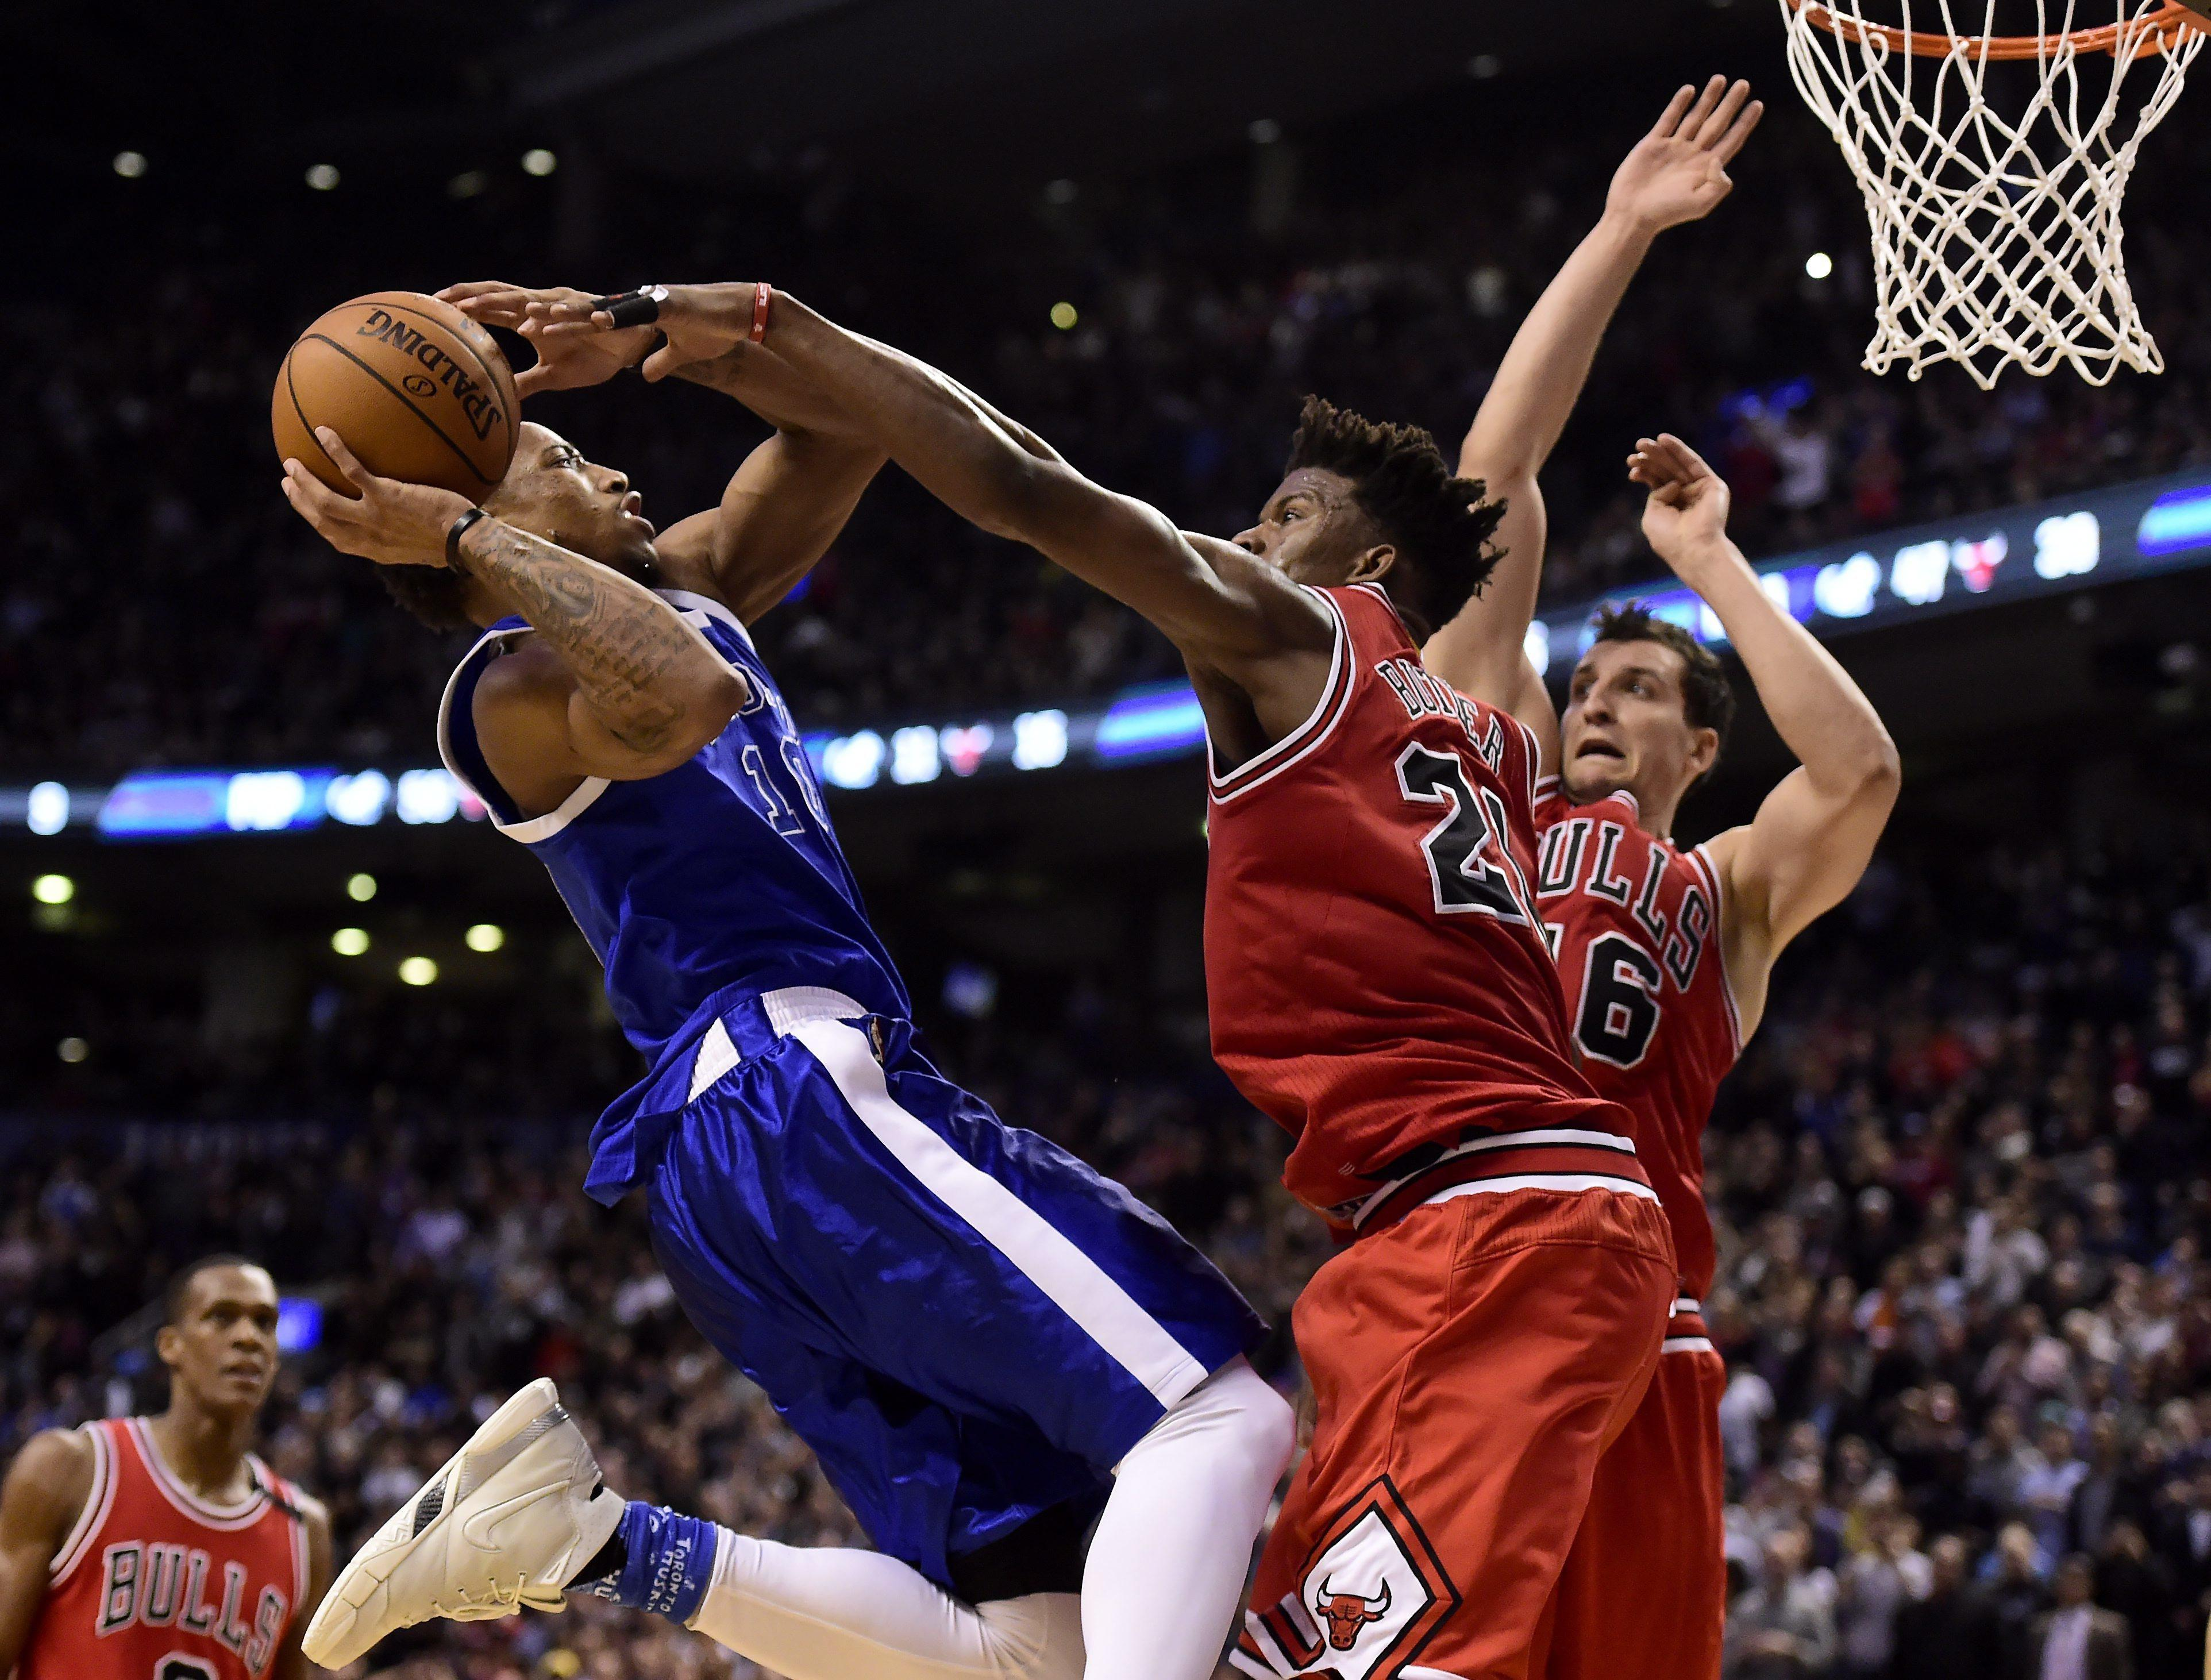 b01130ecae0f Toronto Raptors guard DeMar DeRozan (10) drives to the net to set up  teammate